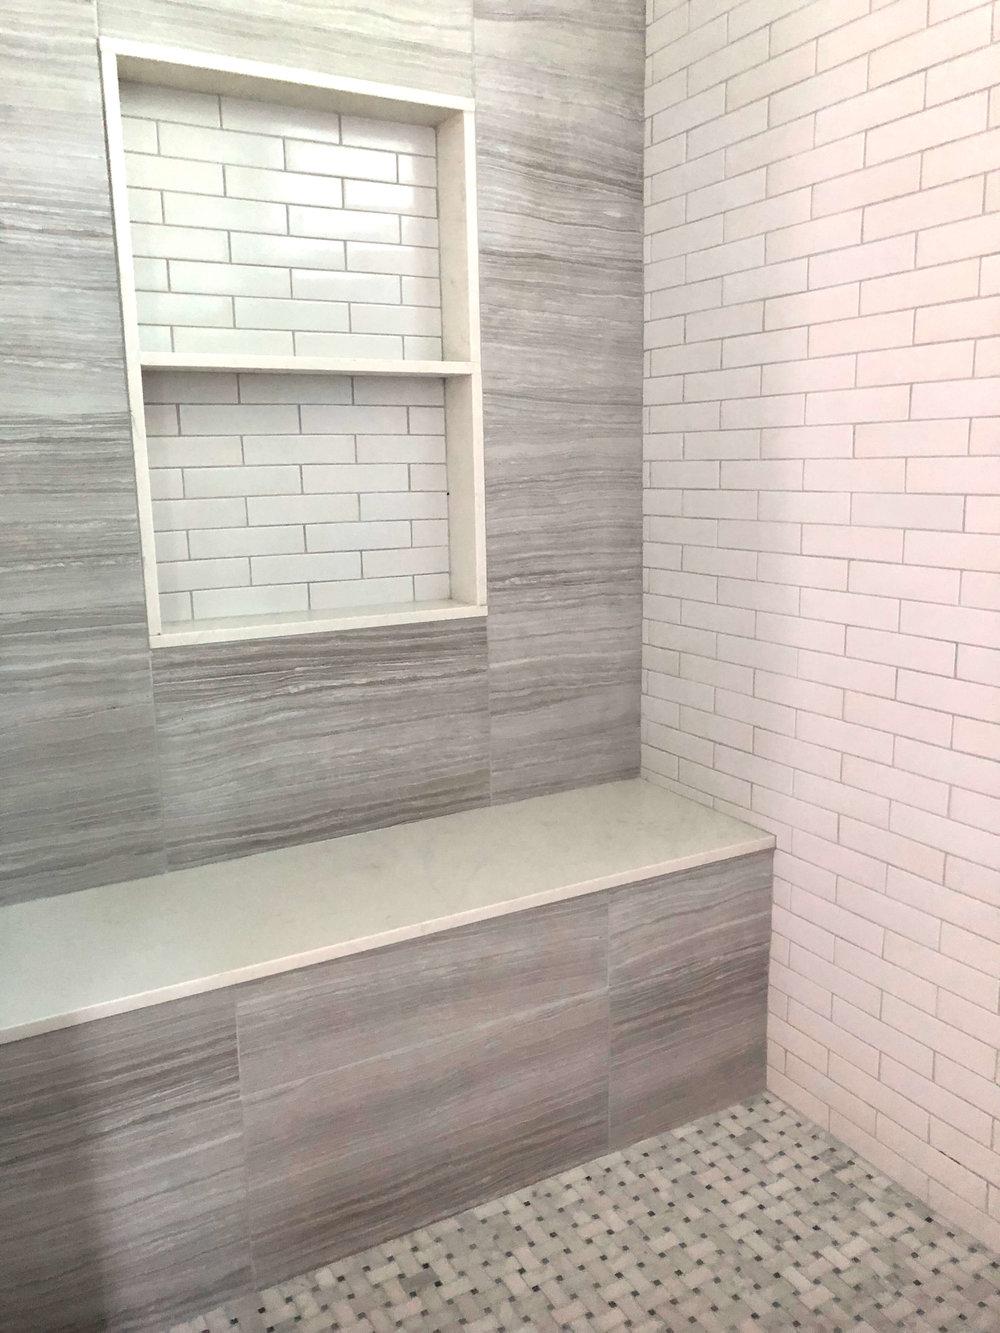 Shampoo niche and shower seat